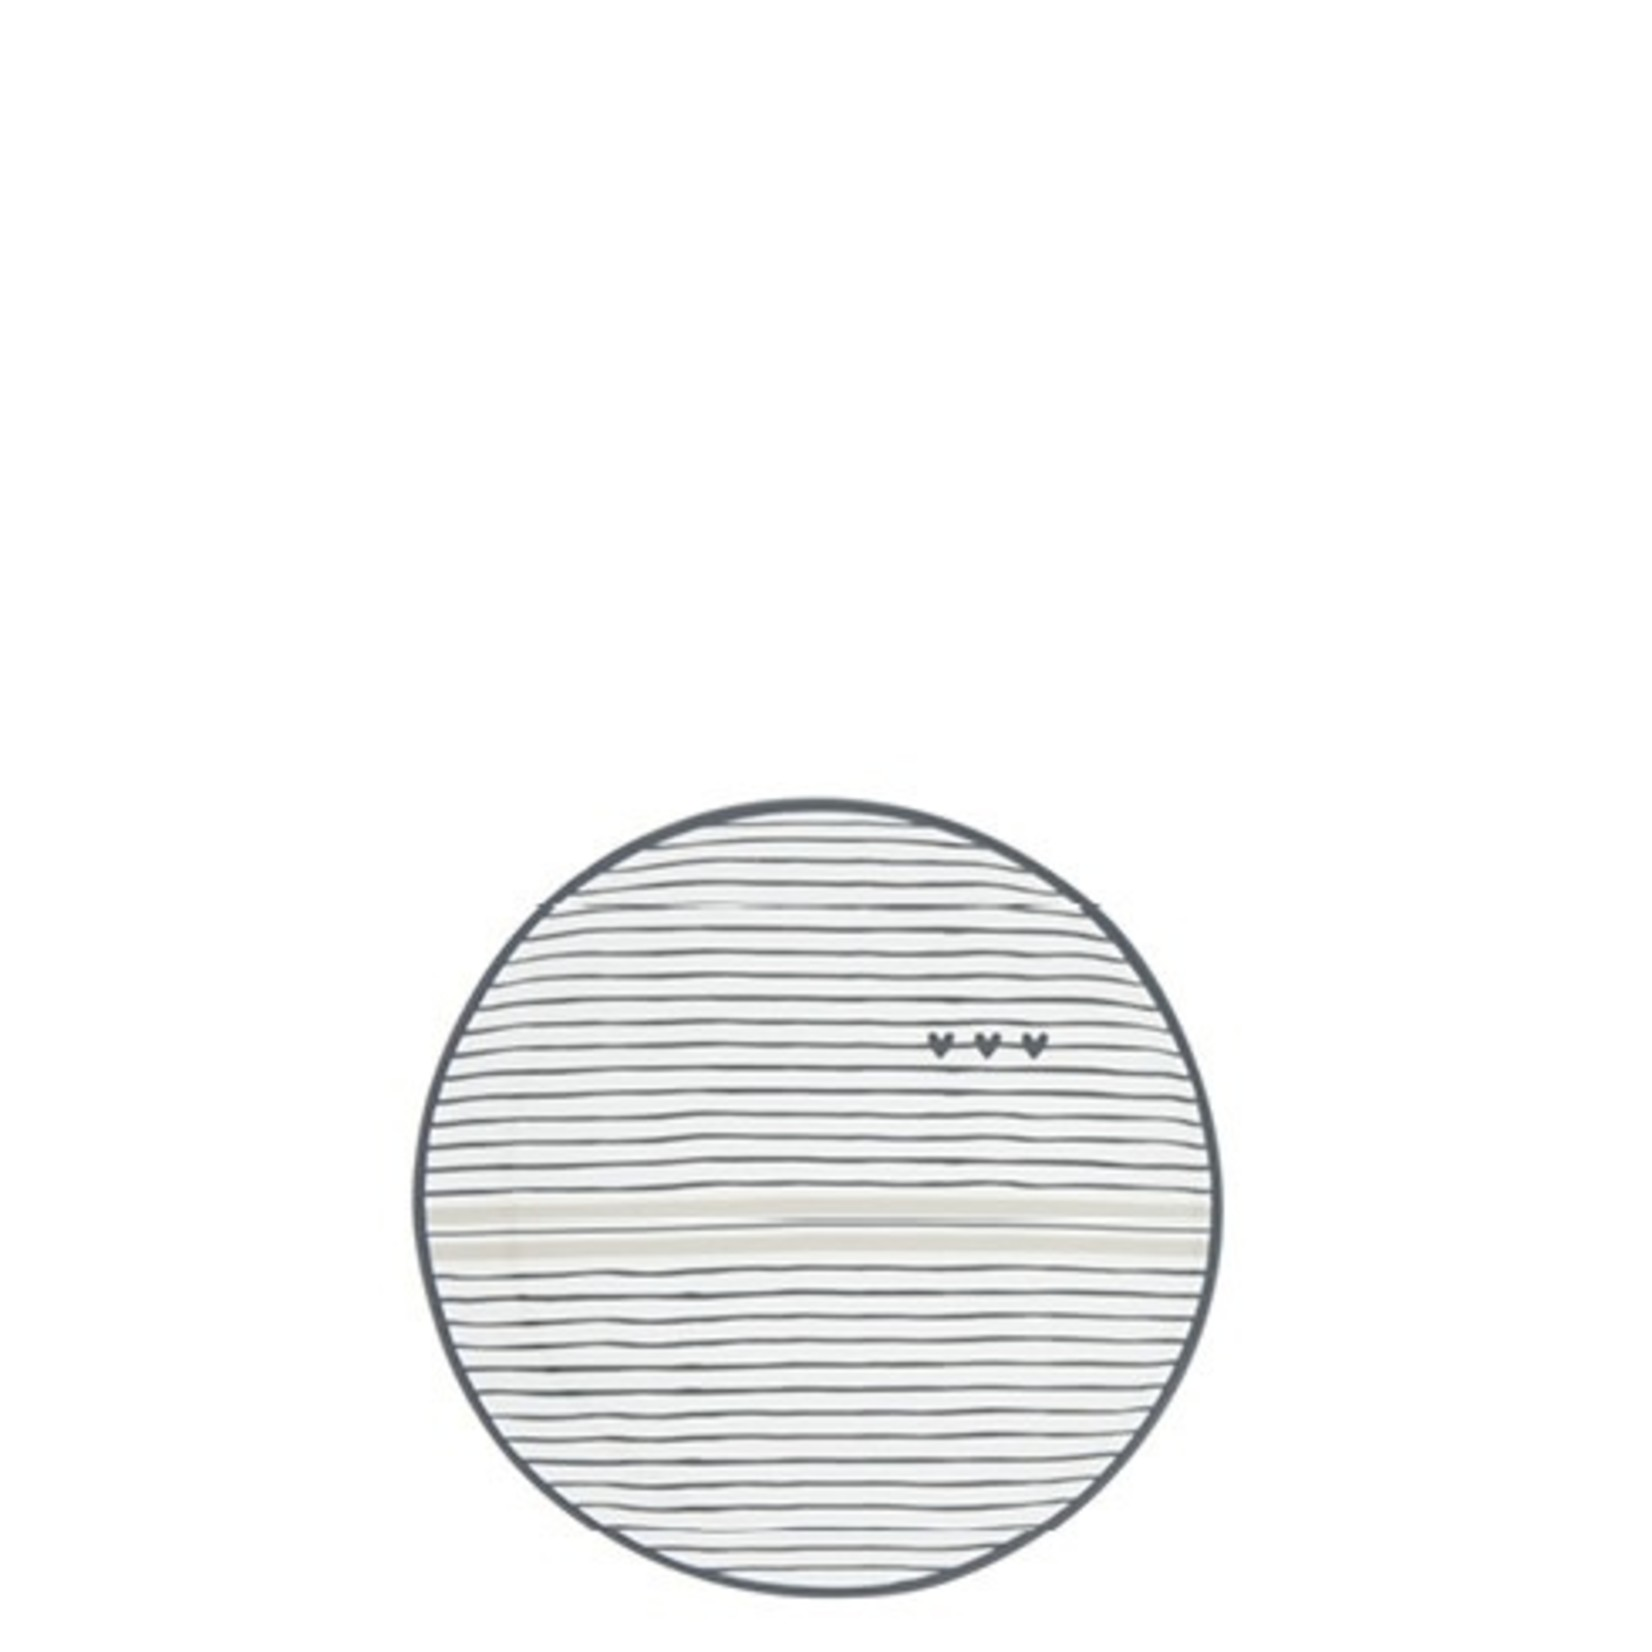 Bastion Collections Tea Tip stripes & hearts white black titane